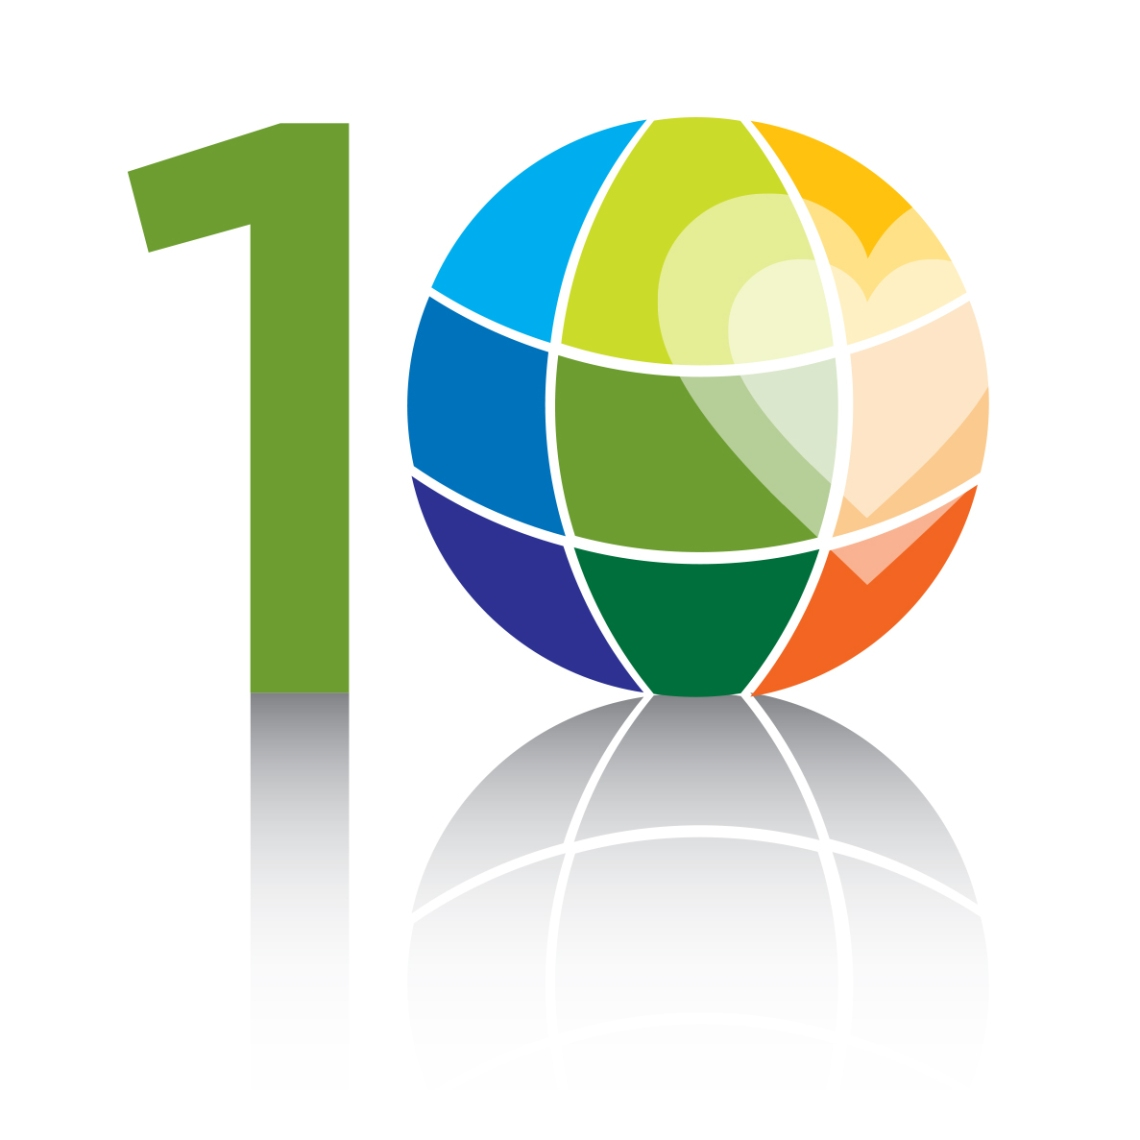 Humane Party 10th Birthday logo by Chris Censullo